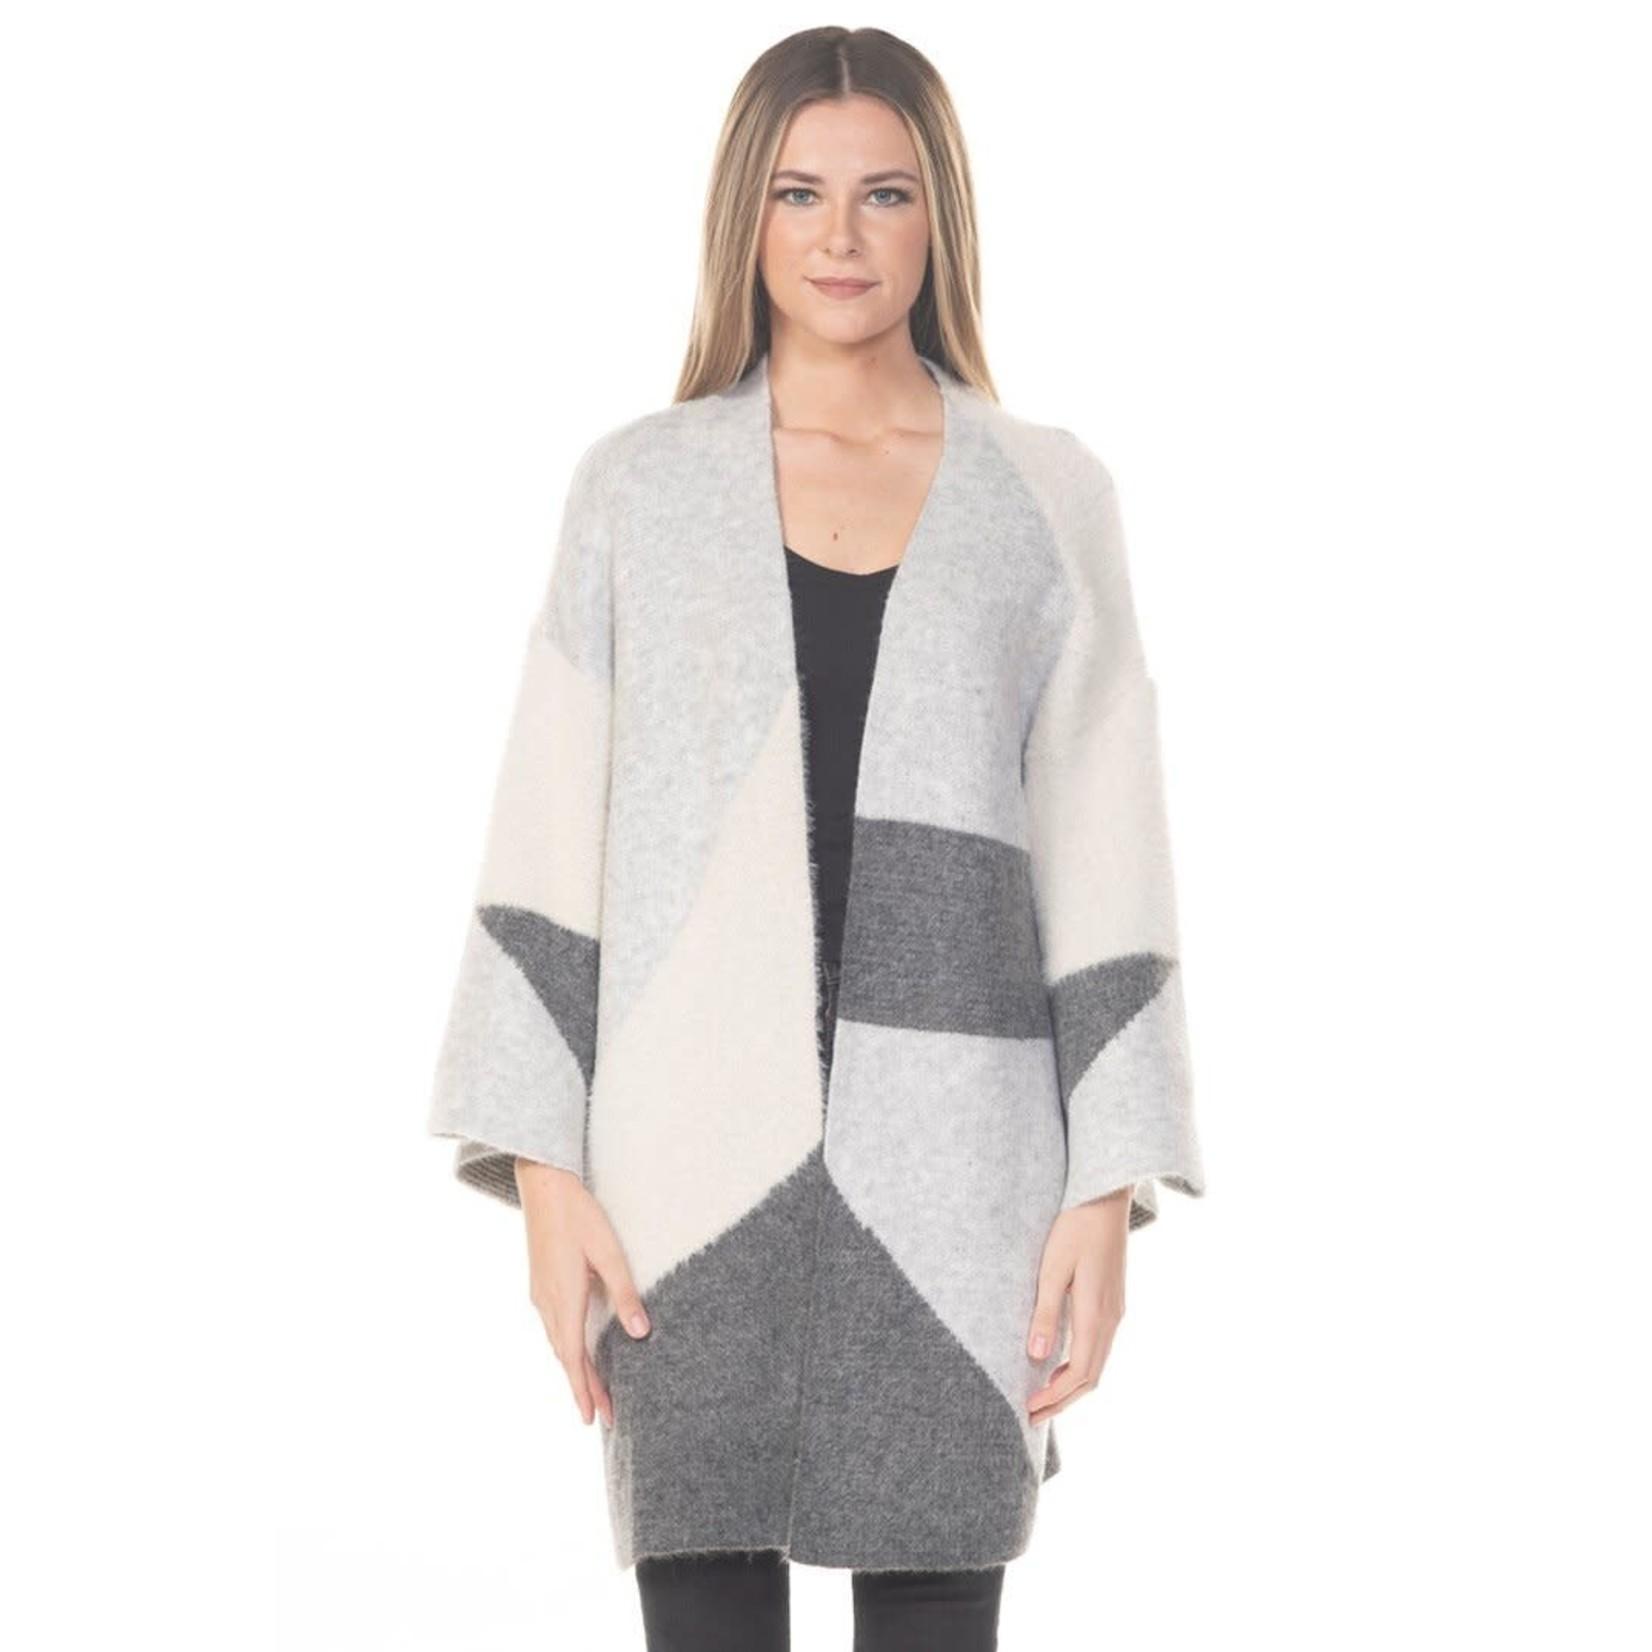 Rain + Rose Color Block Long Cardigan in Greys and White